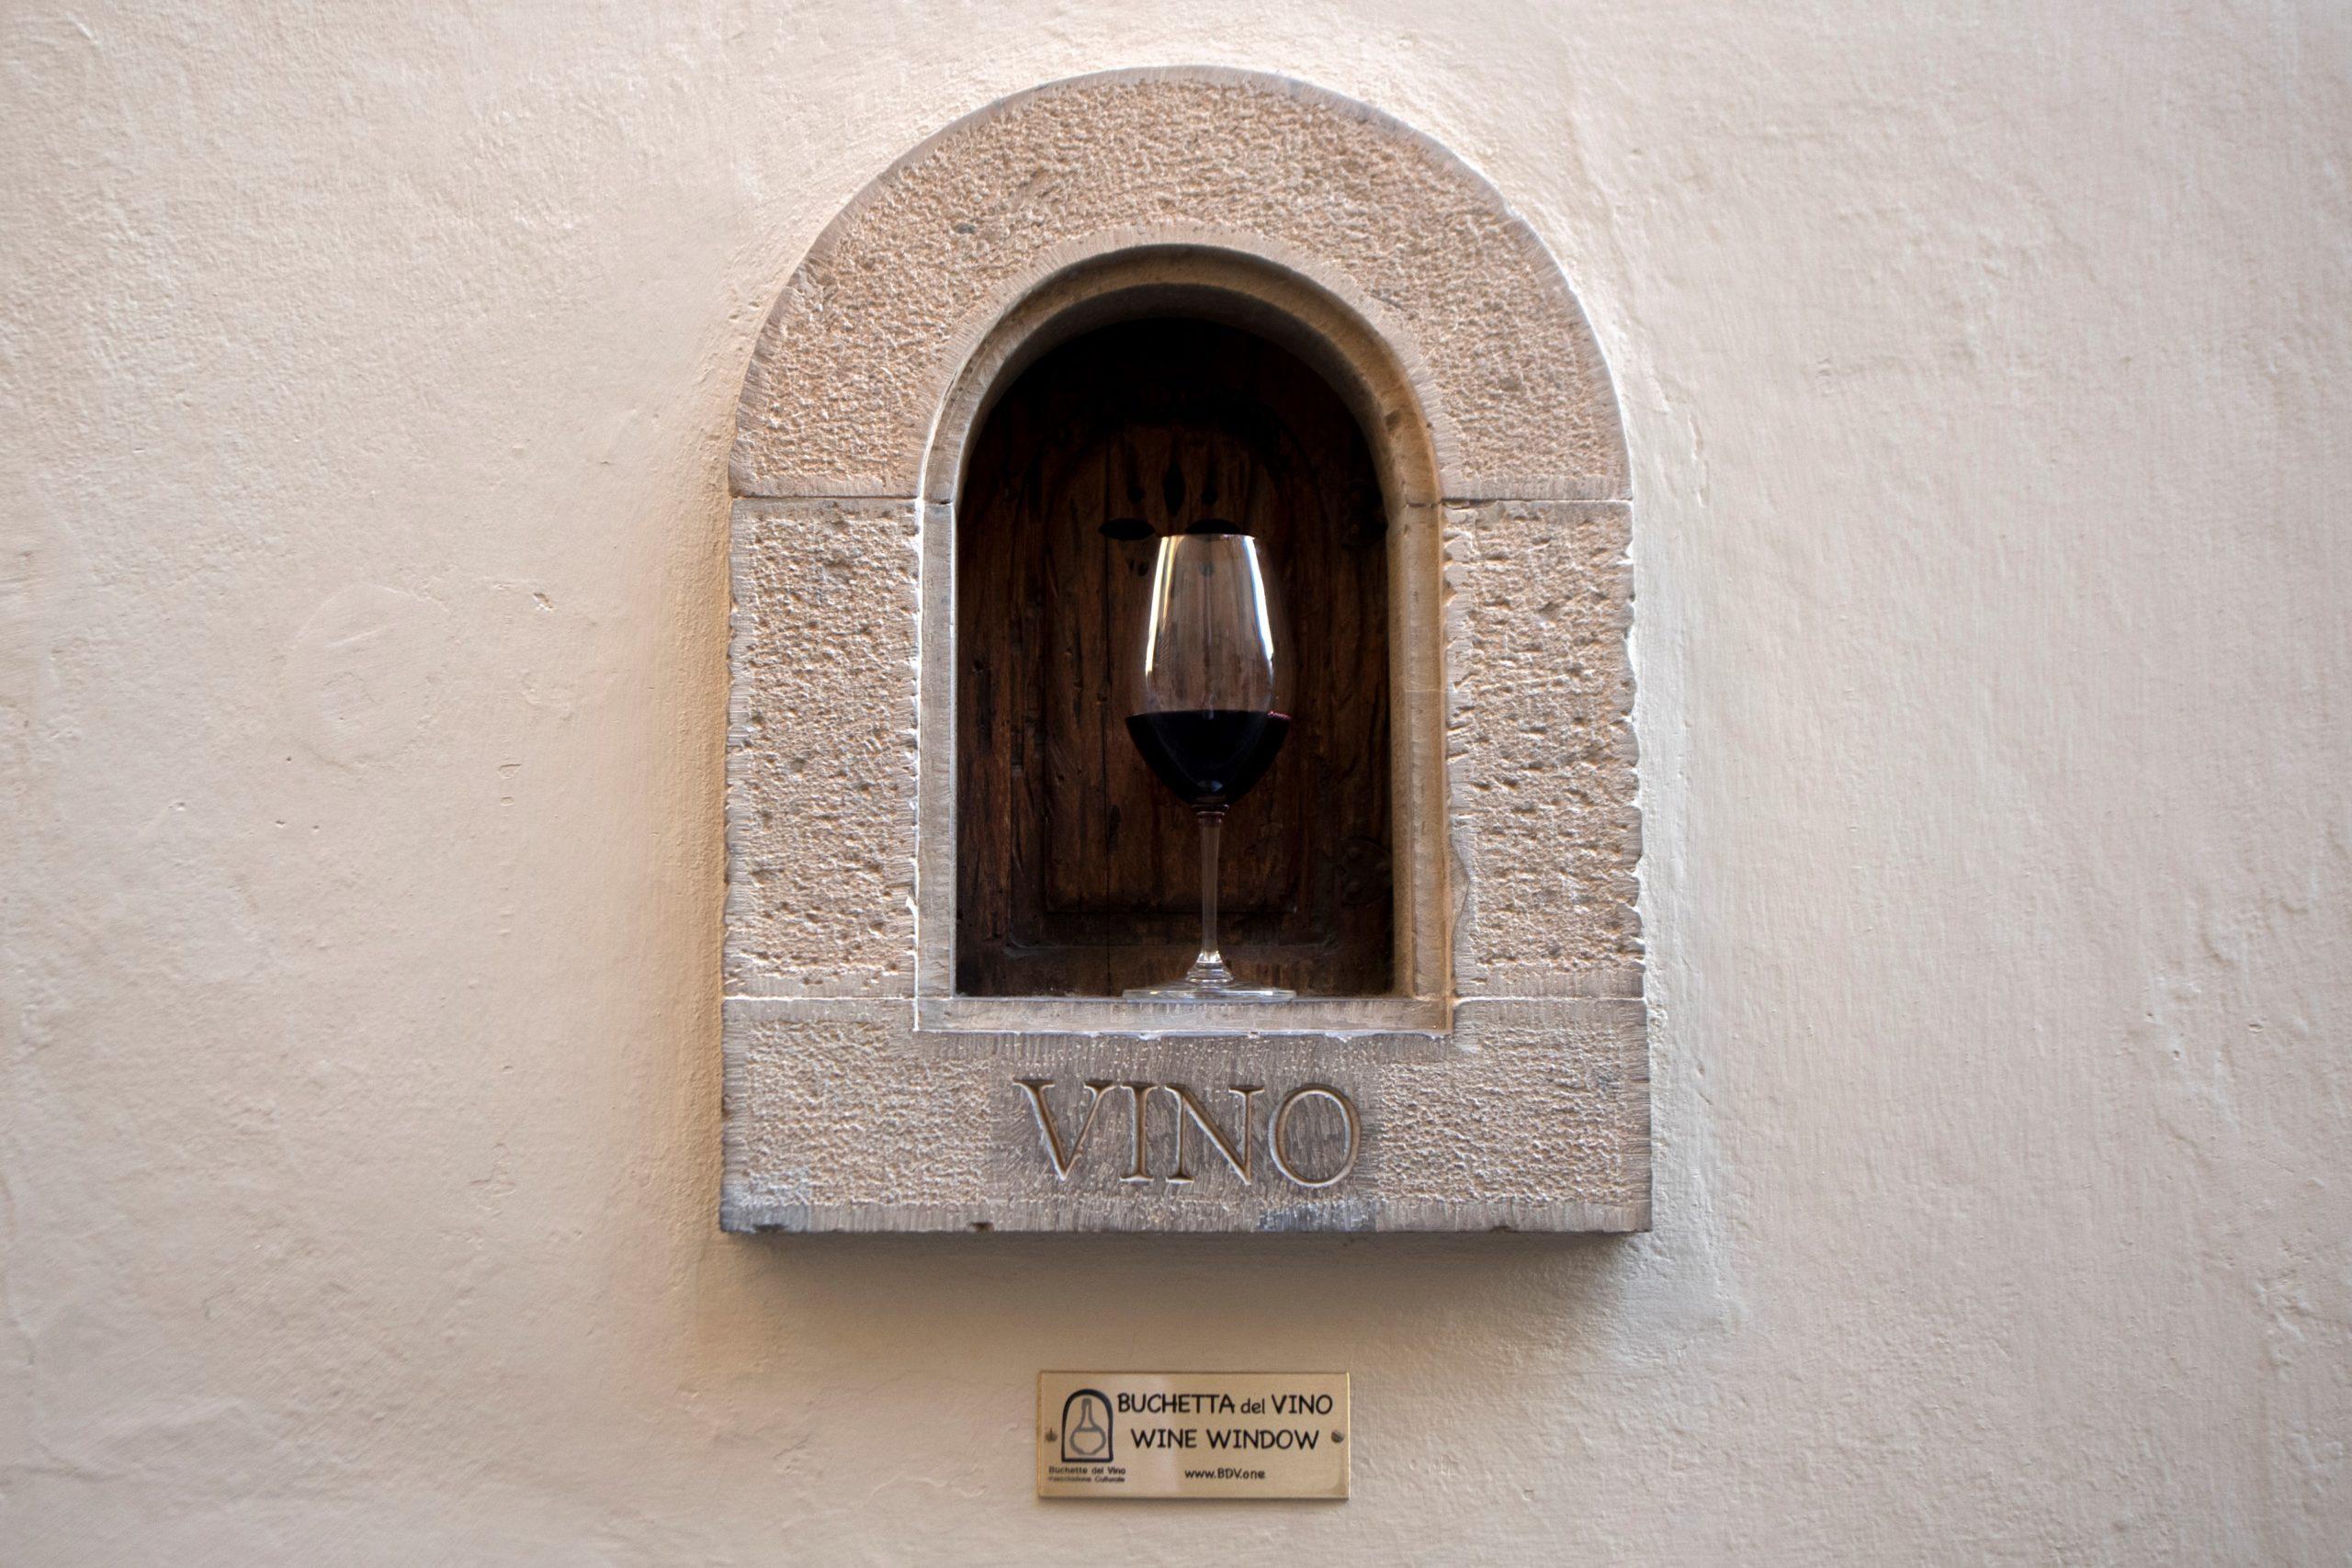 ITALY-WINE-FOOD-DRINK-HEALTH-VIRUS